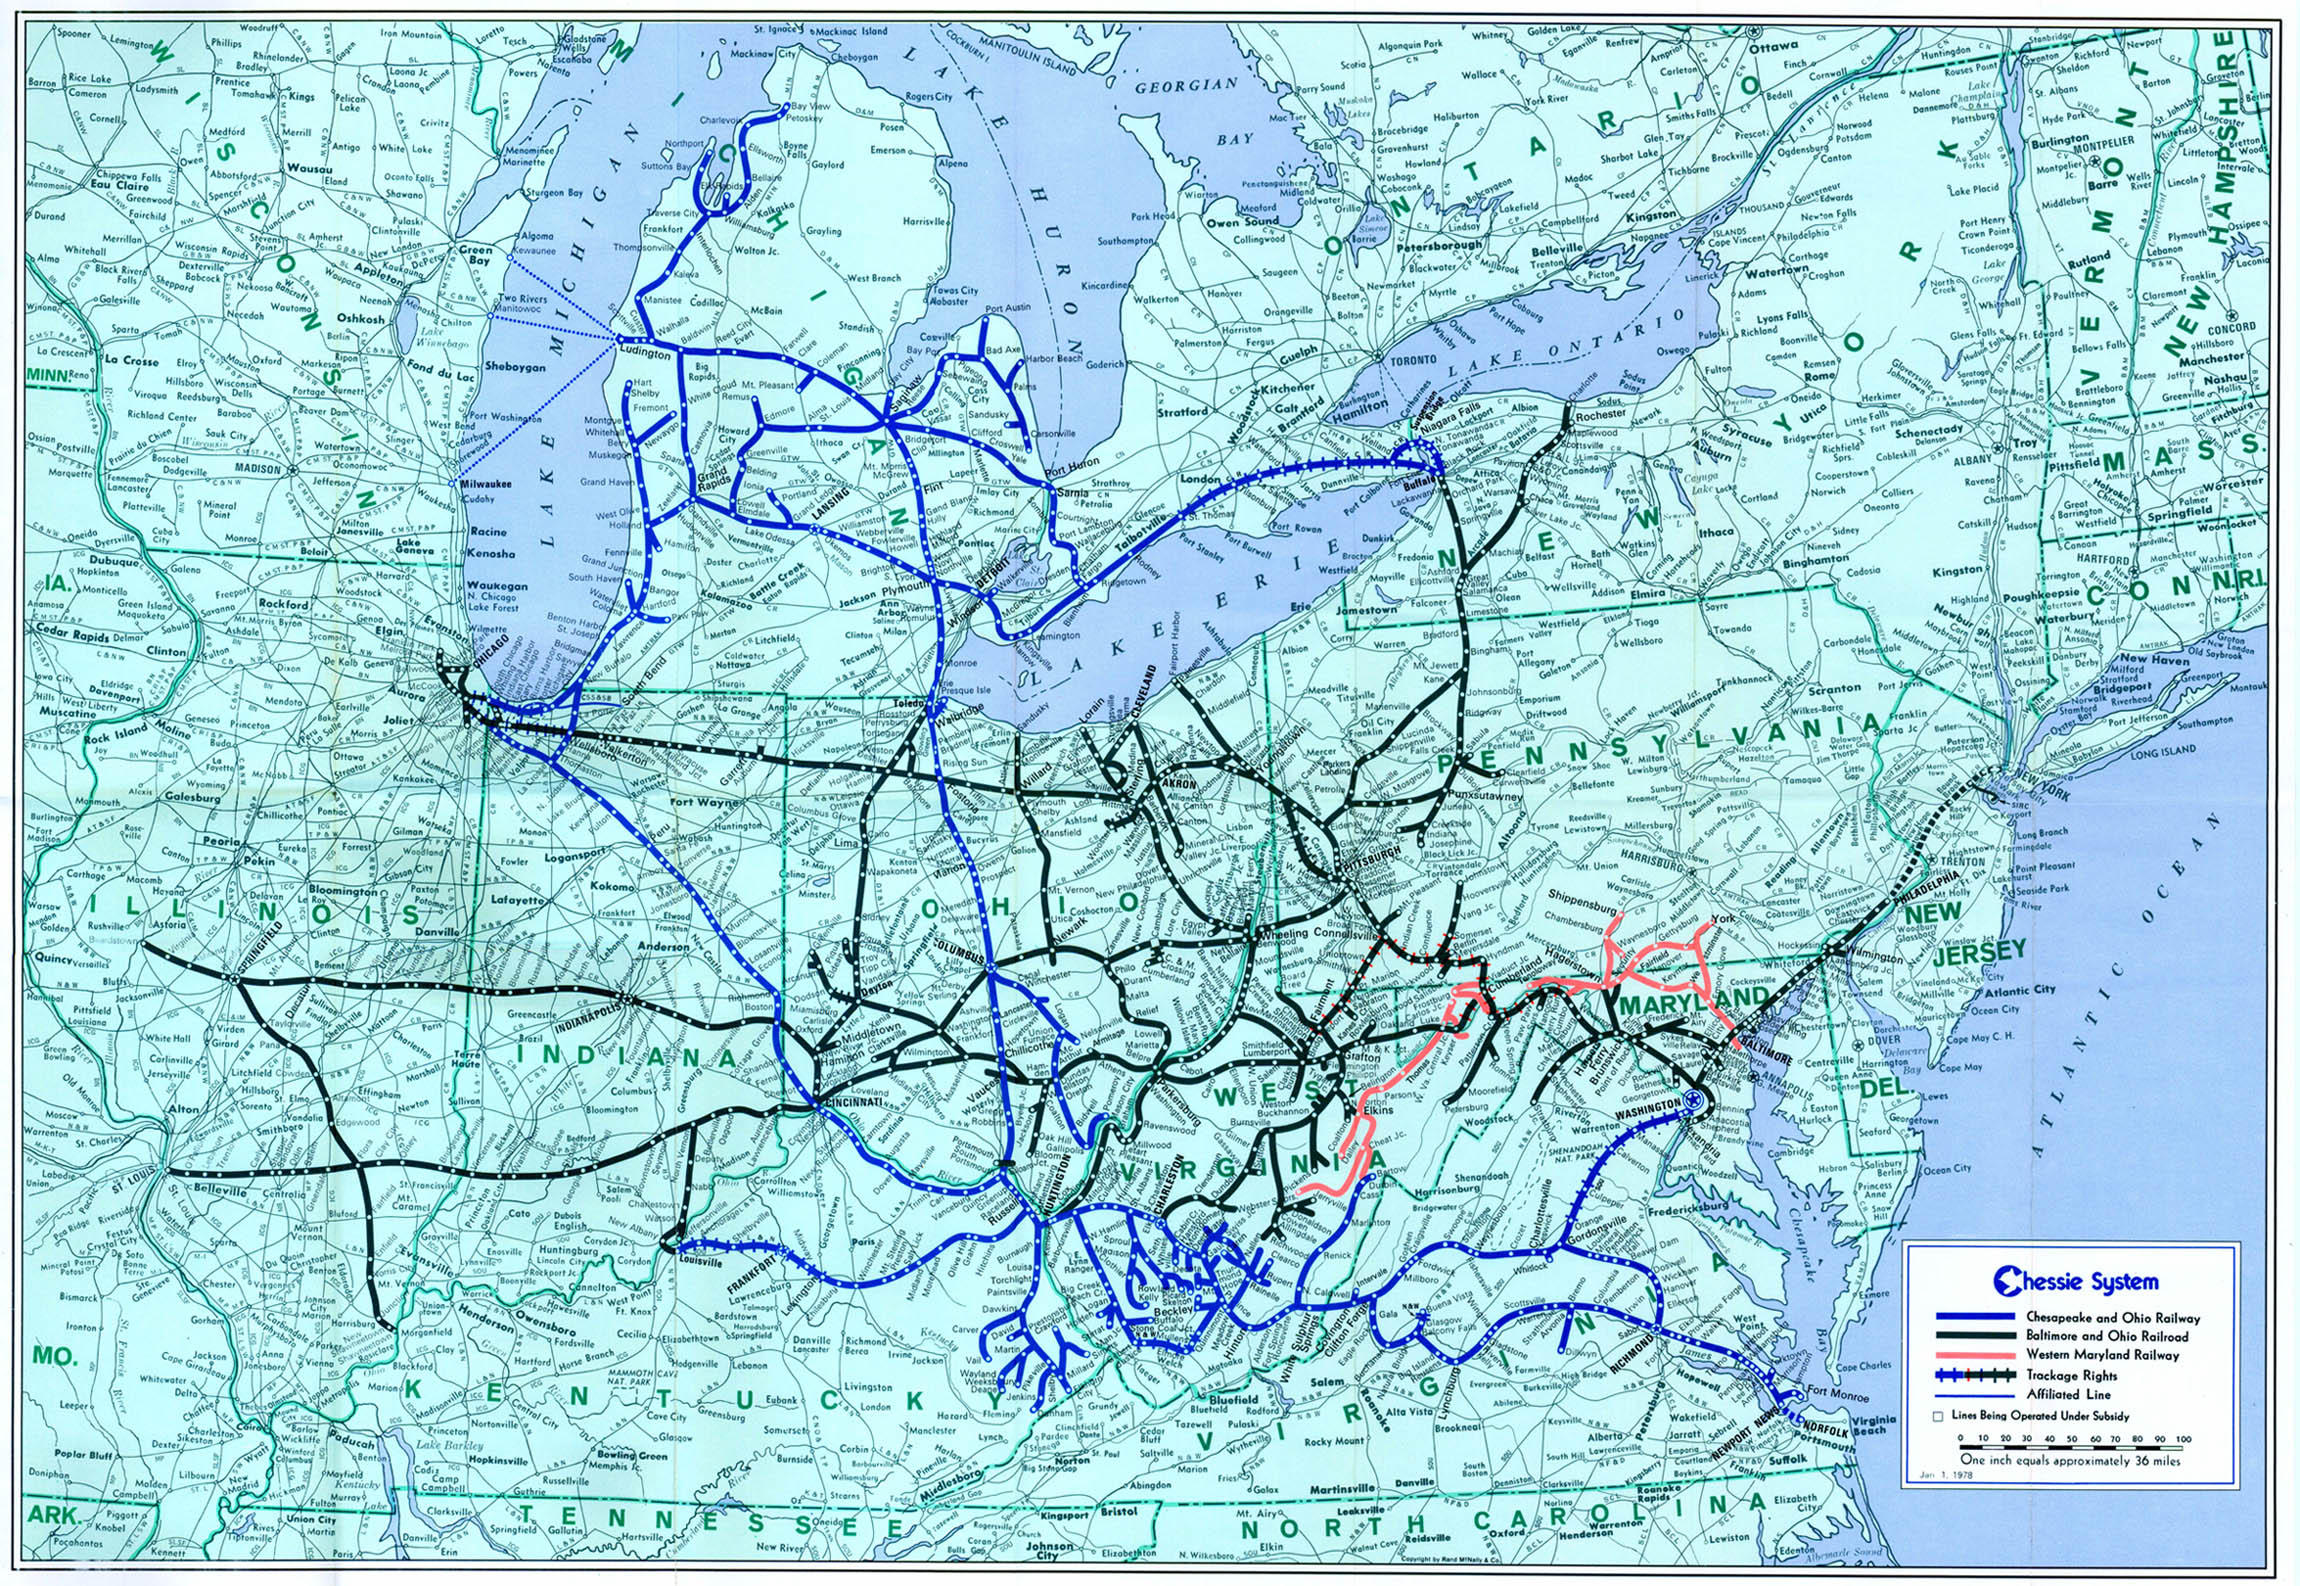 Transportation Company - Chessie System - Railroad